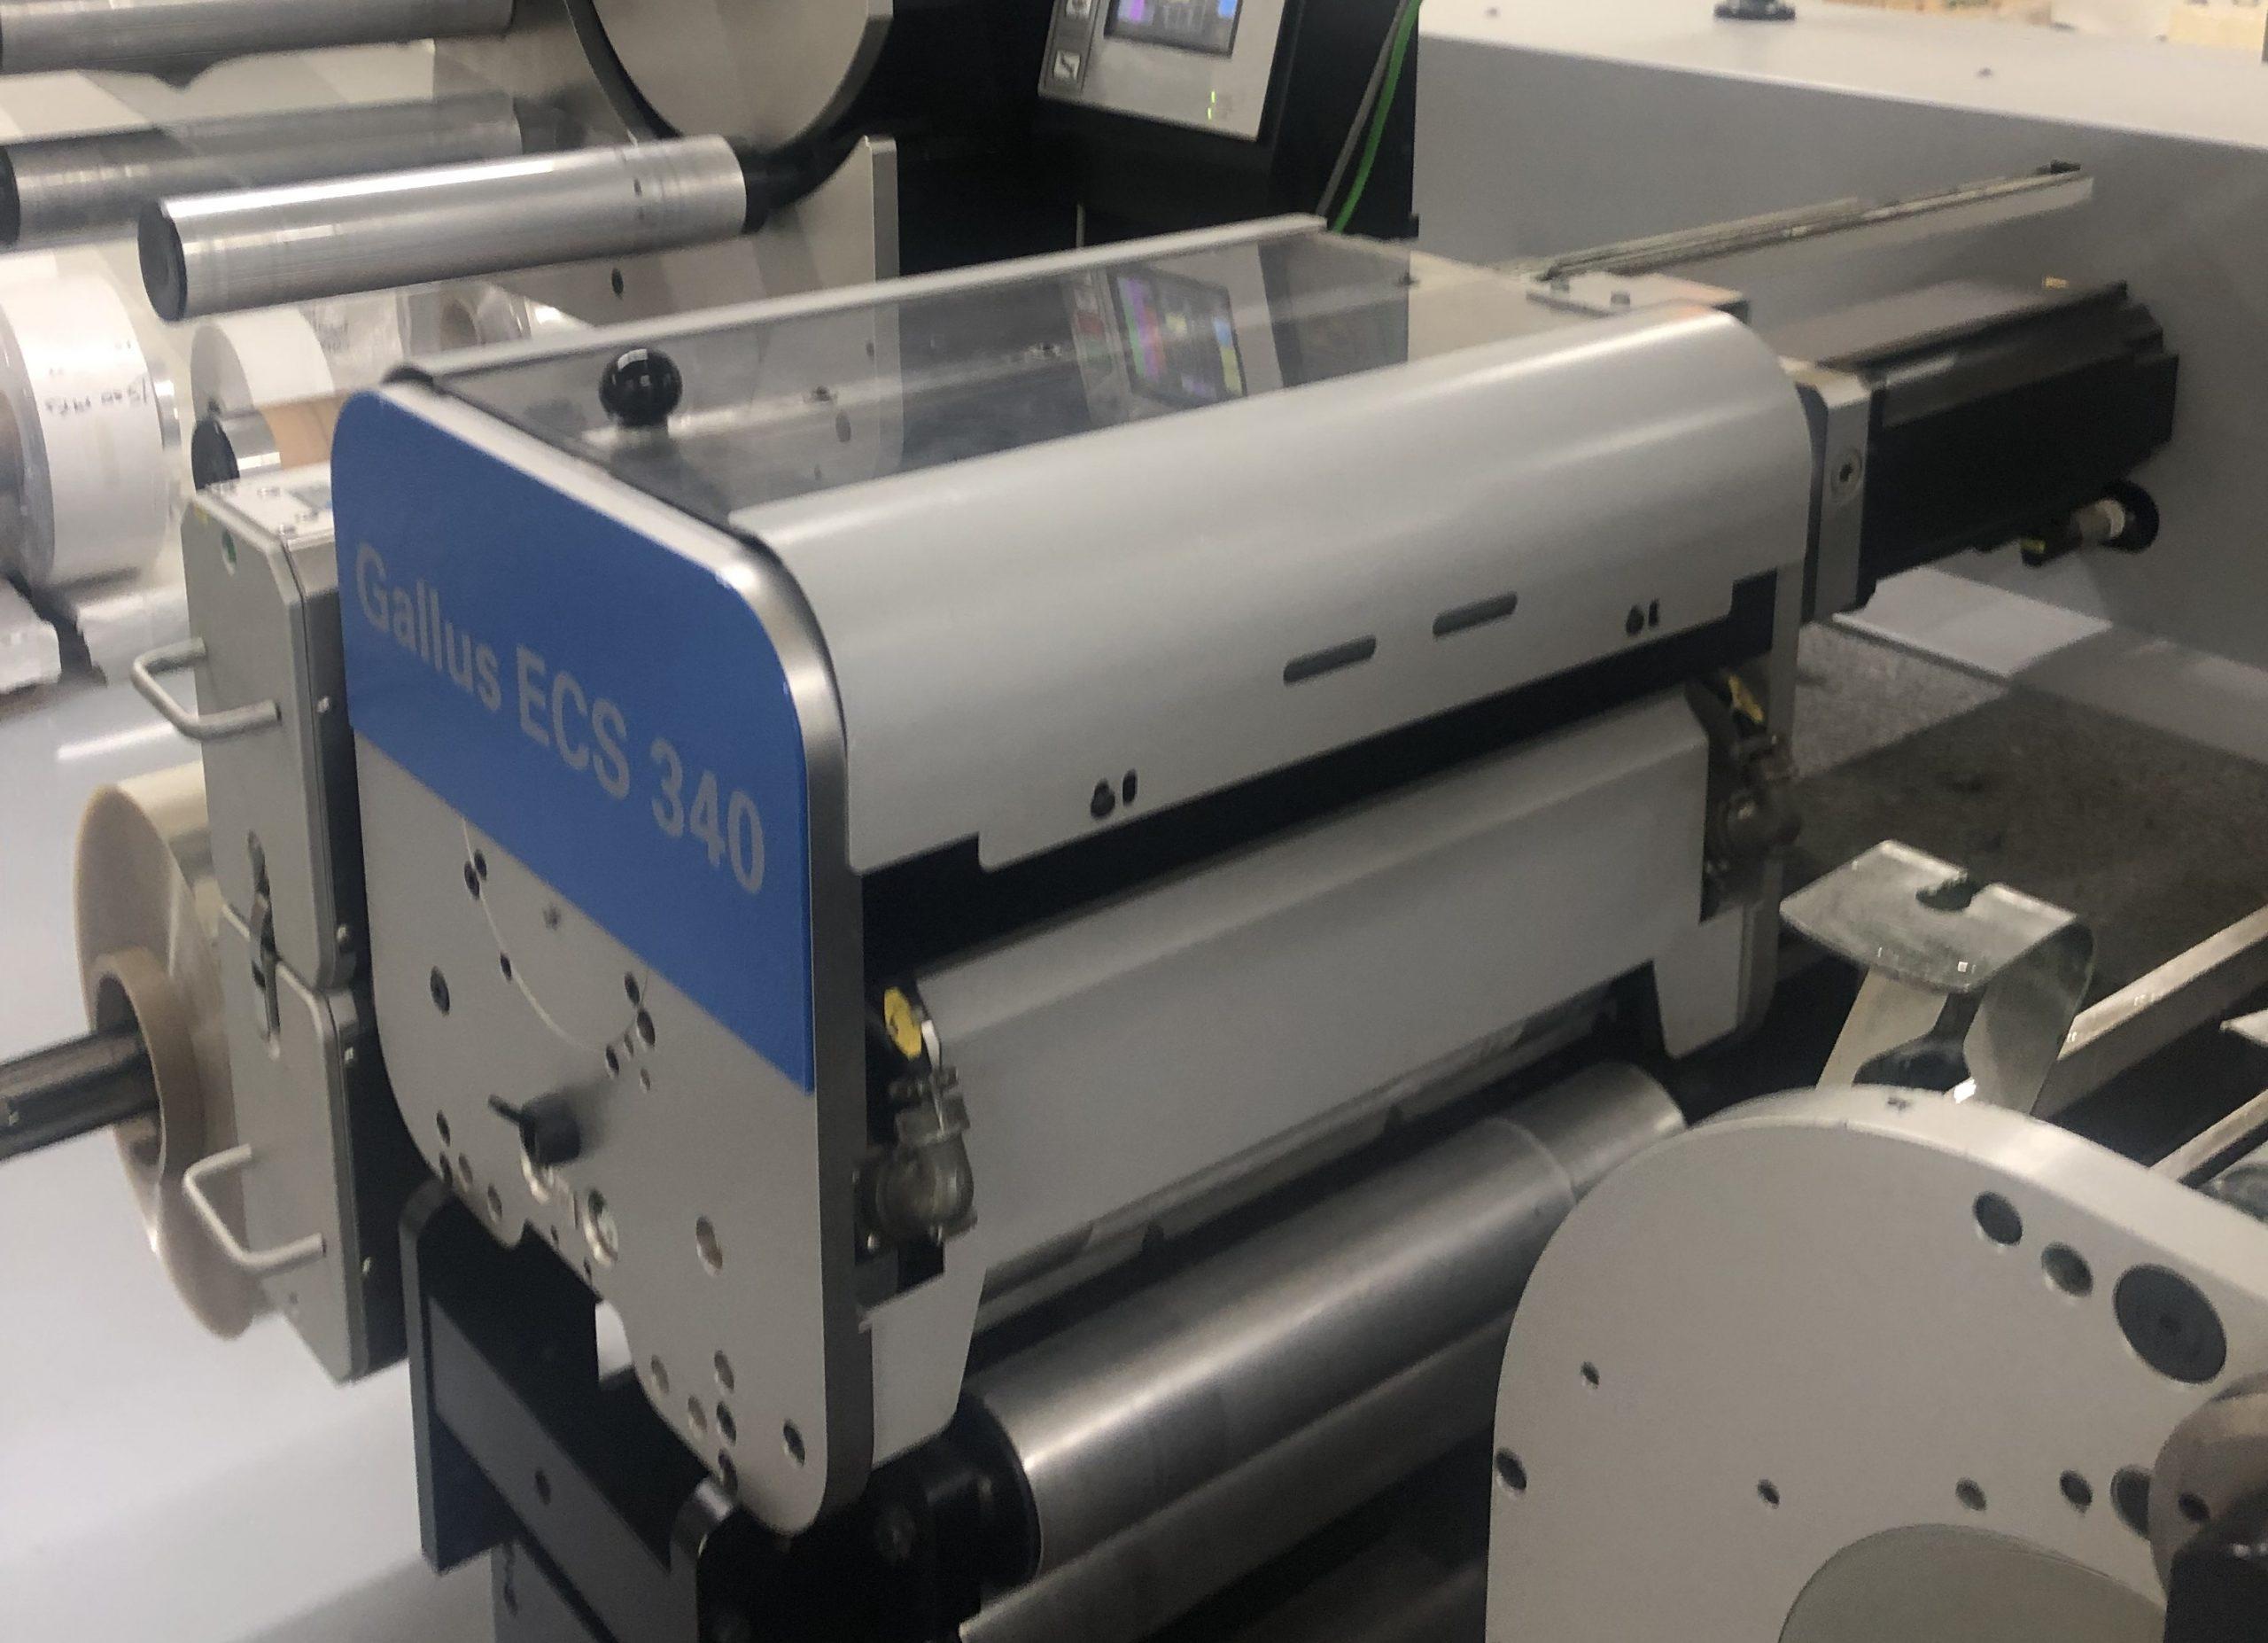 Gallus ECS340 - Used Flexo Printing Presses and Used Flexographic Equipment-0